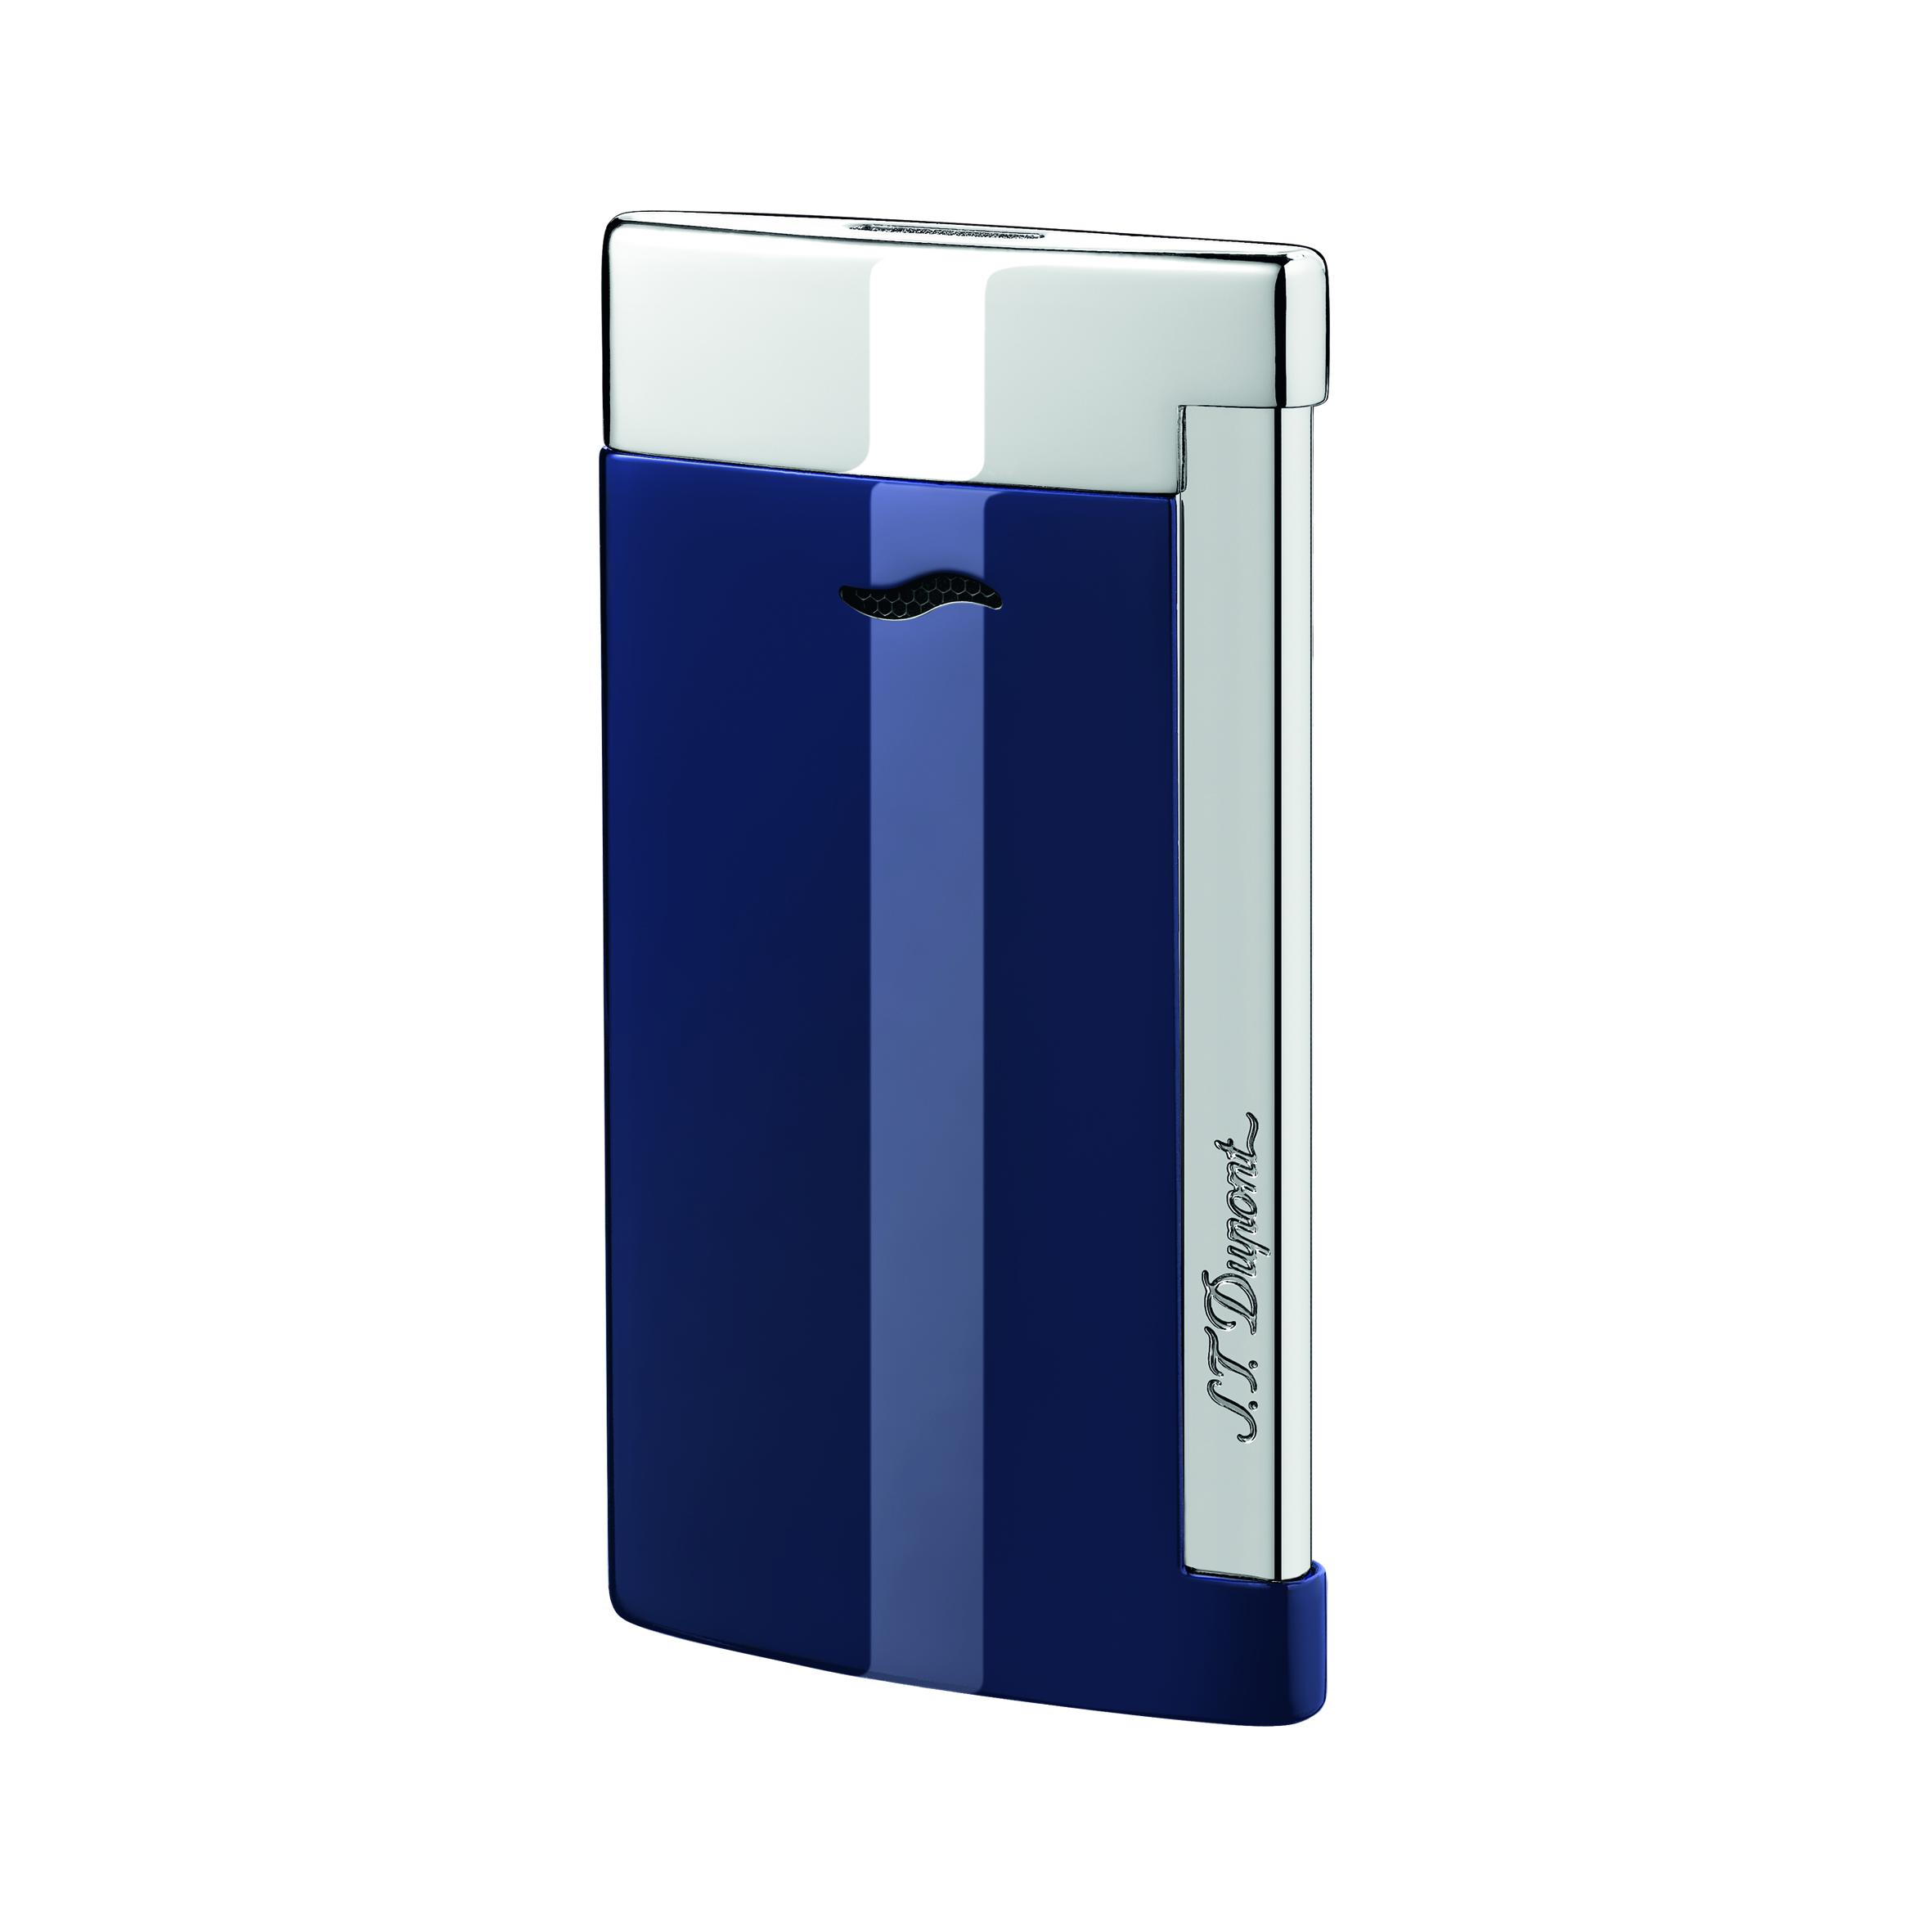 S.T. Dupont Slim 7 Chrome/Blue